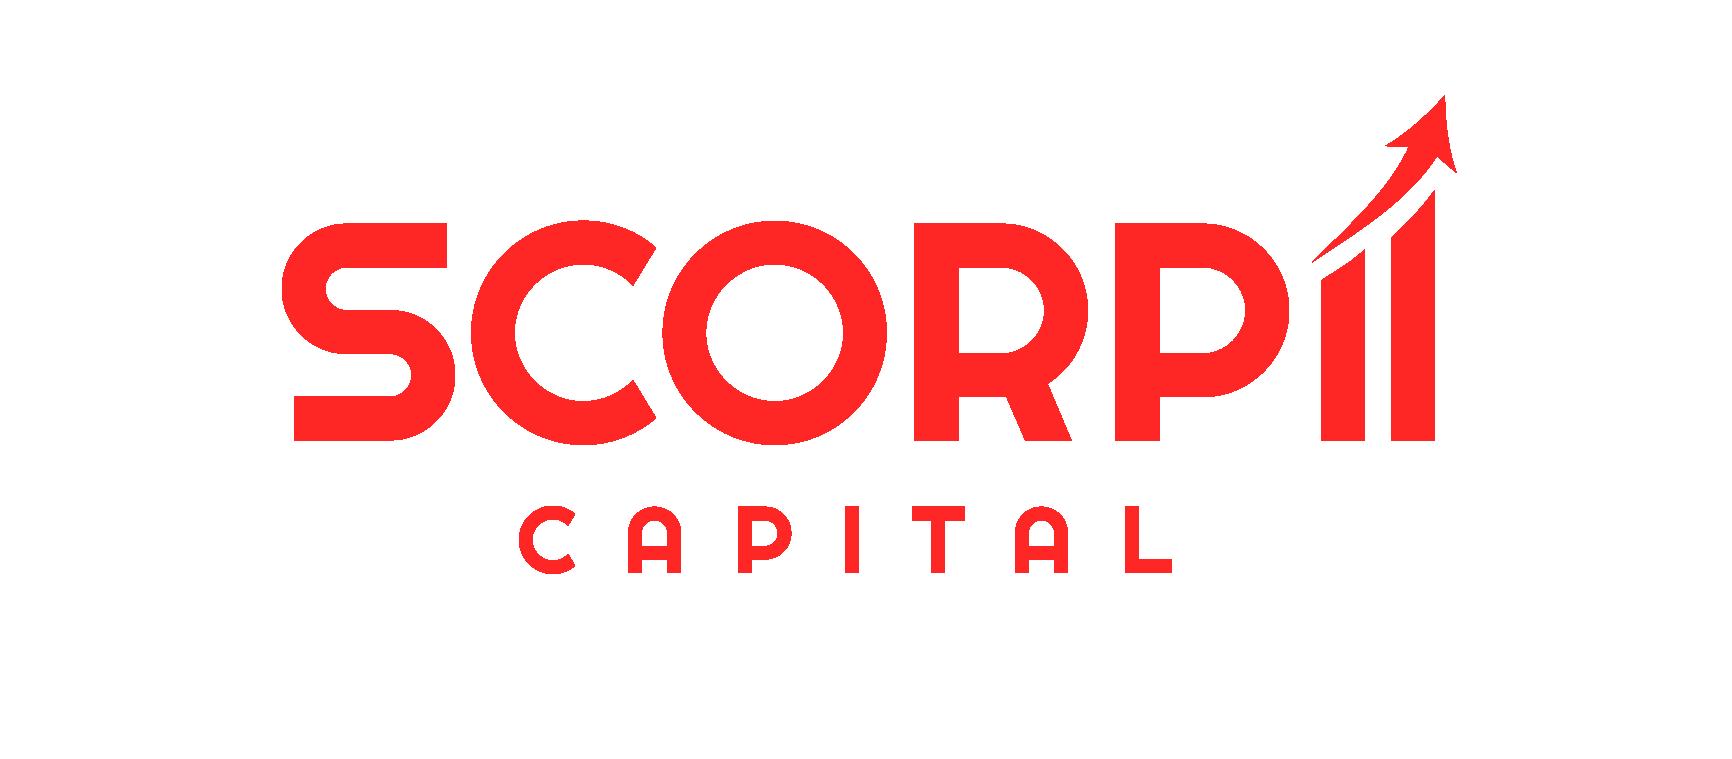 Scorpii Capital